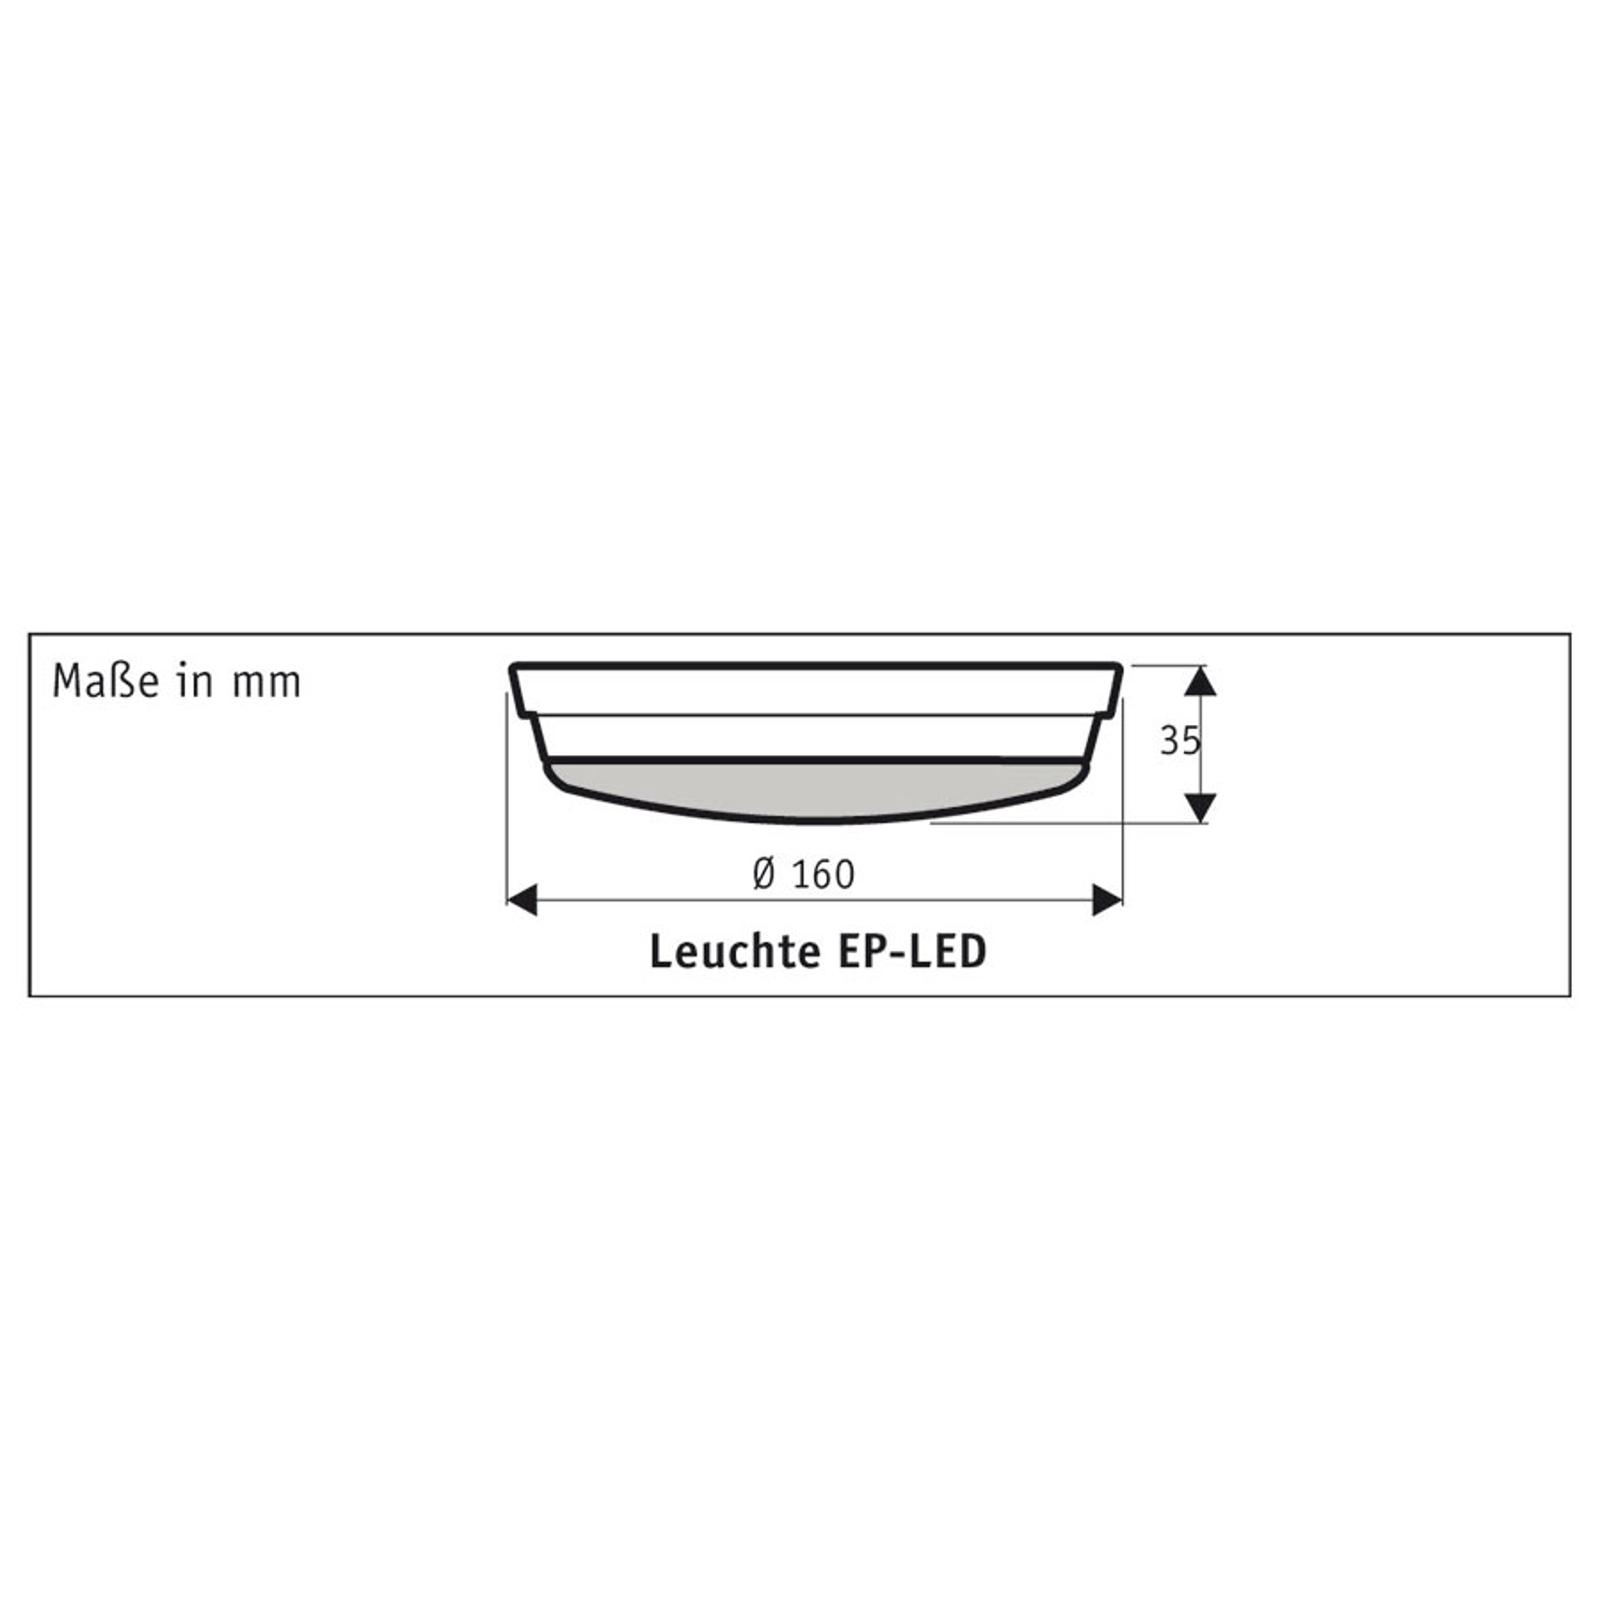 Kit LED para Eco Plano II, cromo cepillado